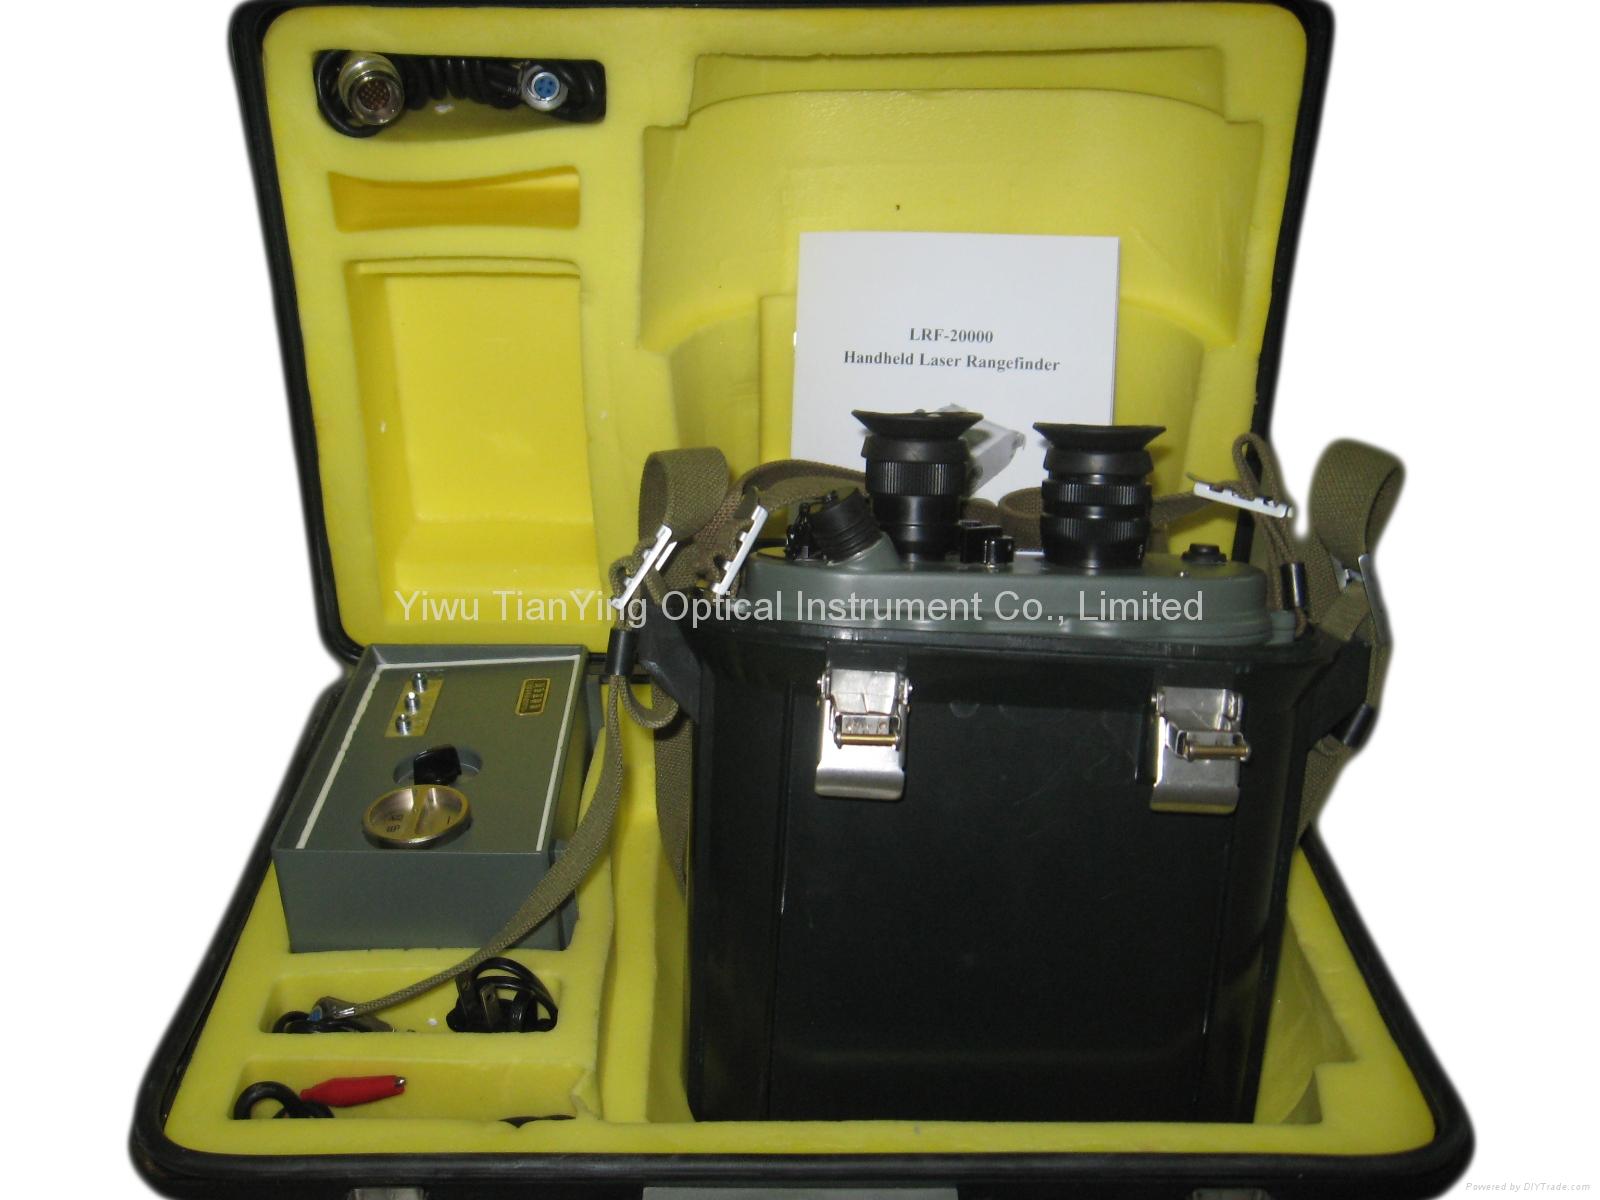 20km 0.2Hz Continuous Rate Eye Safe Laser Rangefinder Binoculars Packing-1